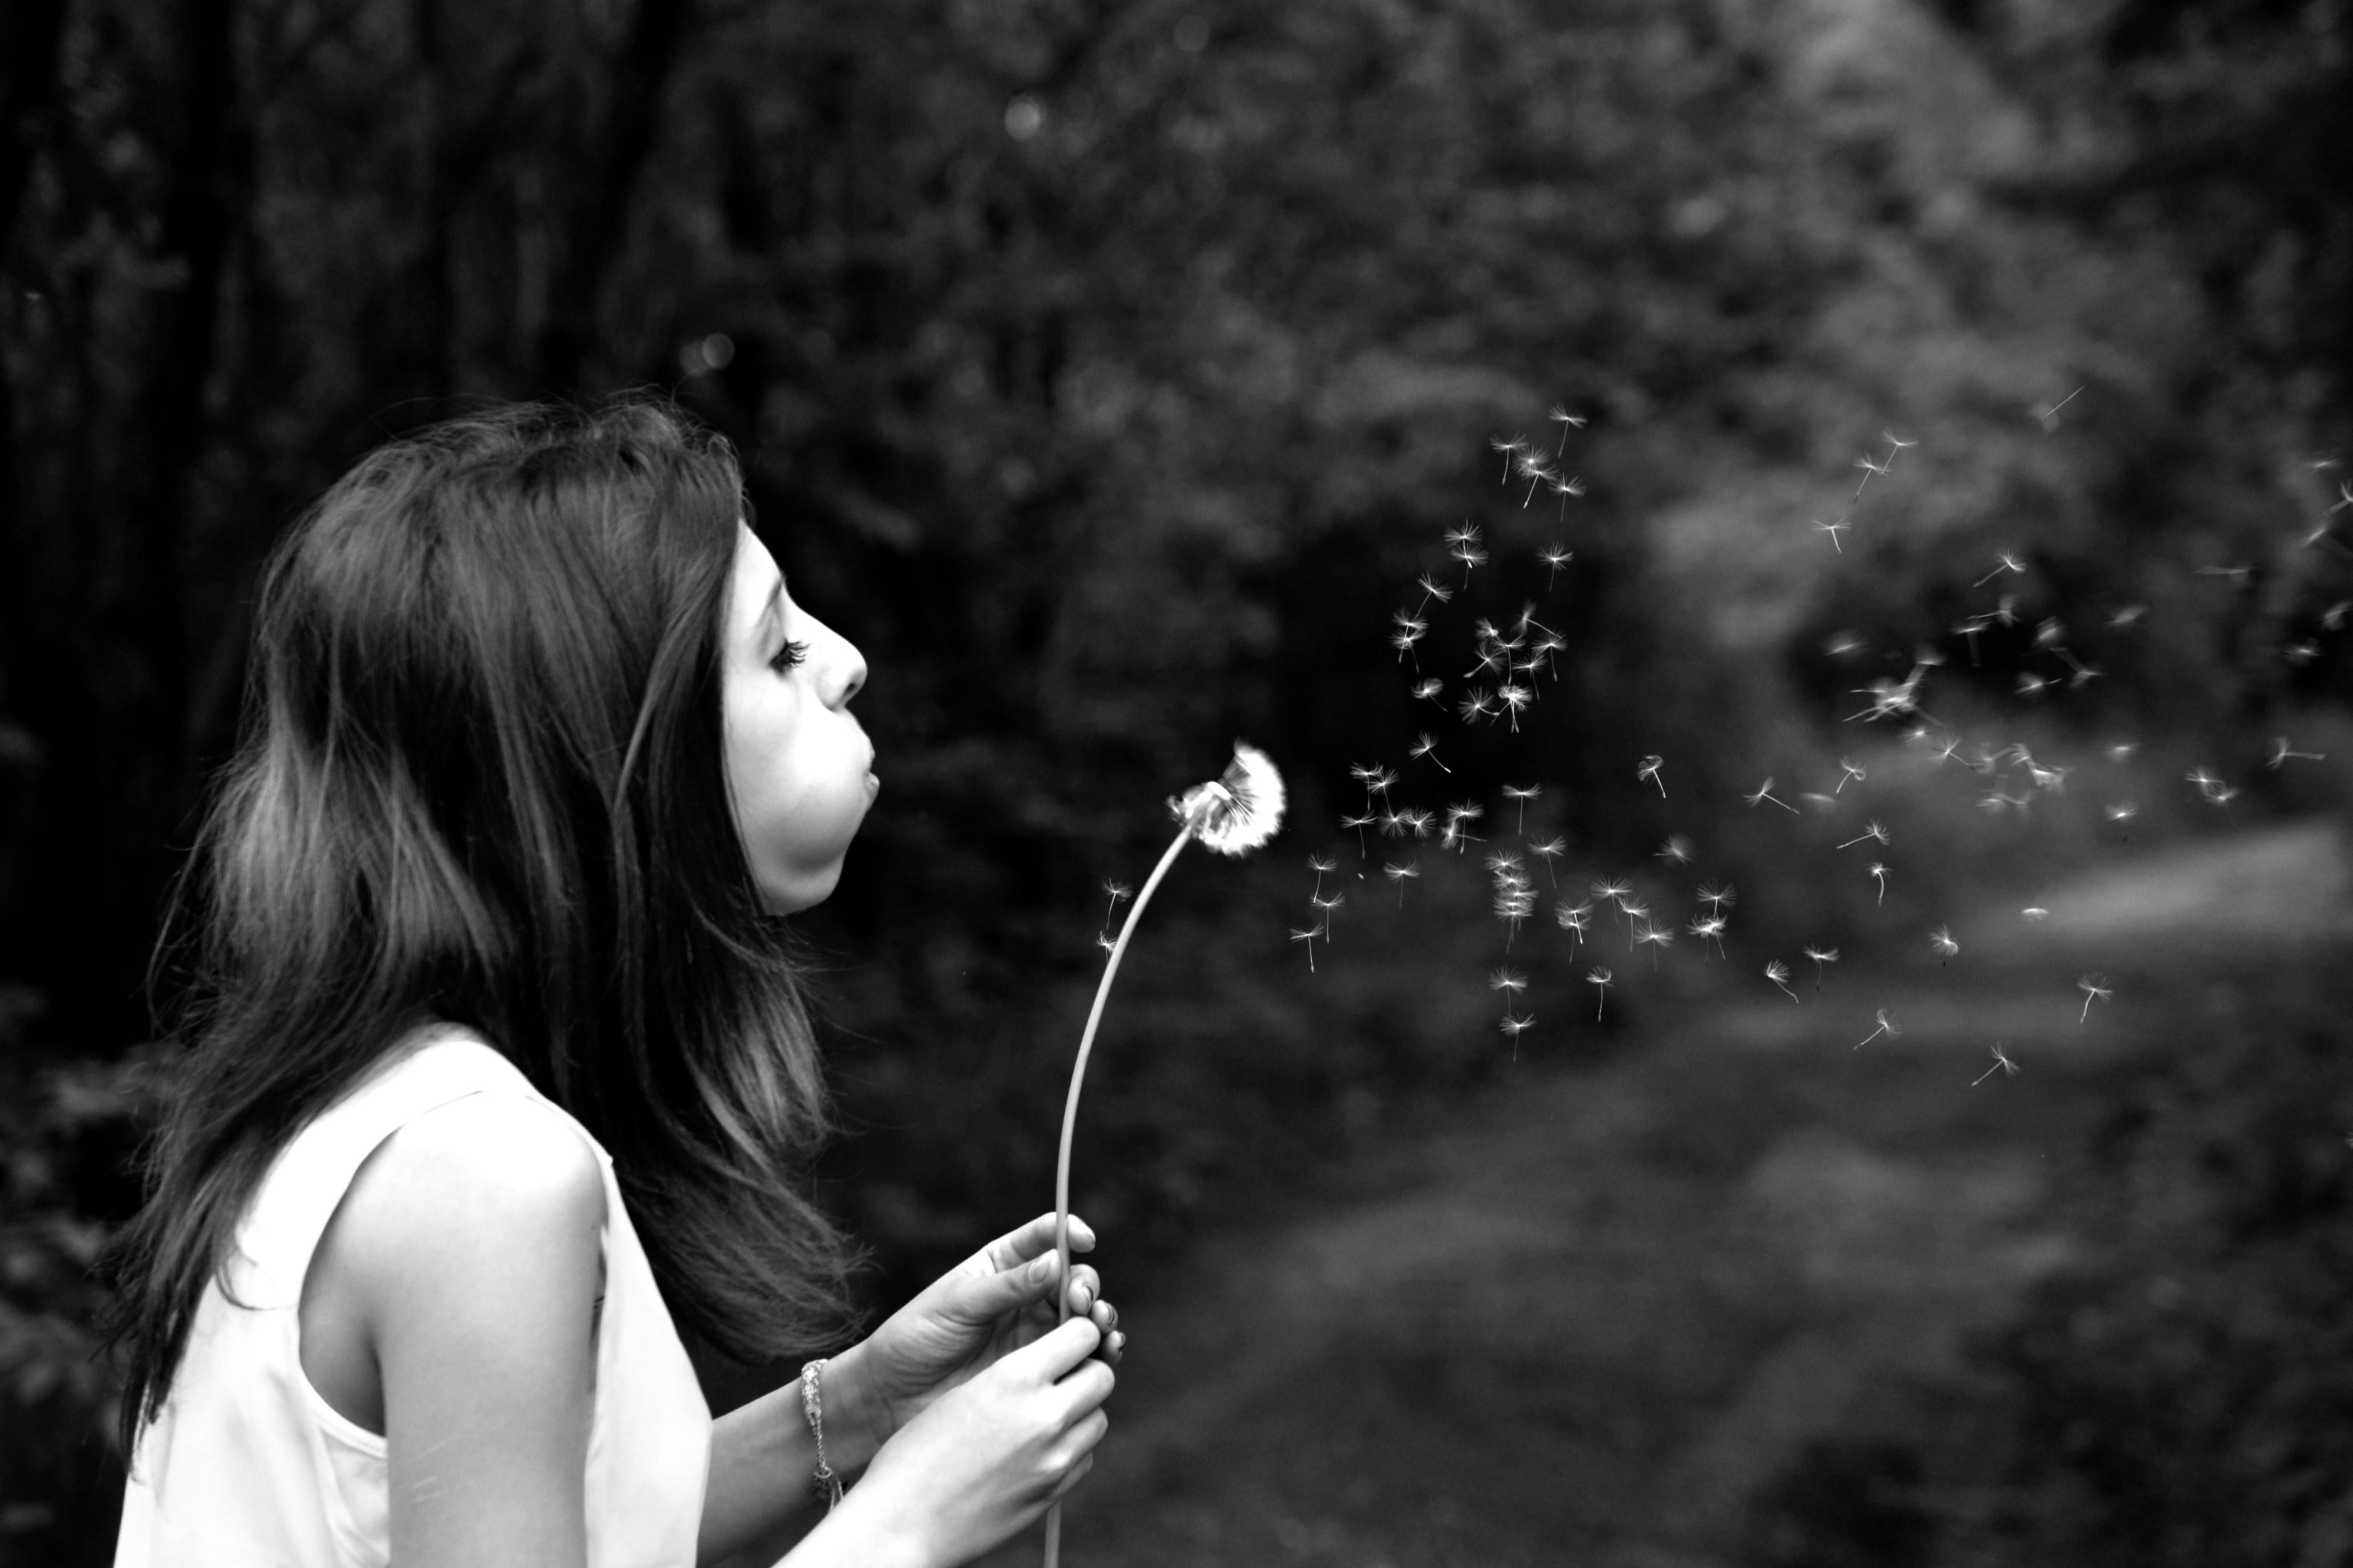 girl-dandelion-wish-summer